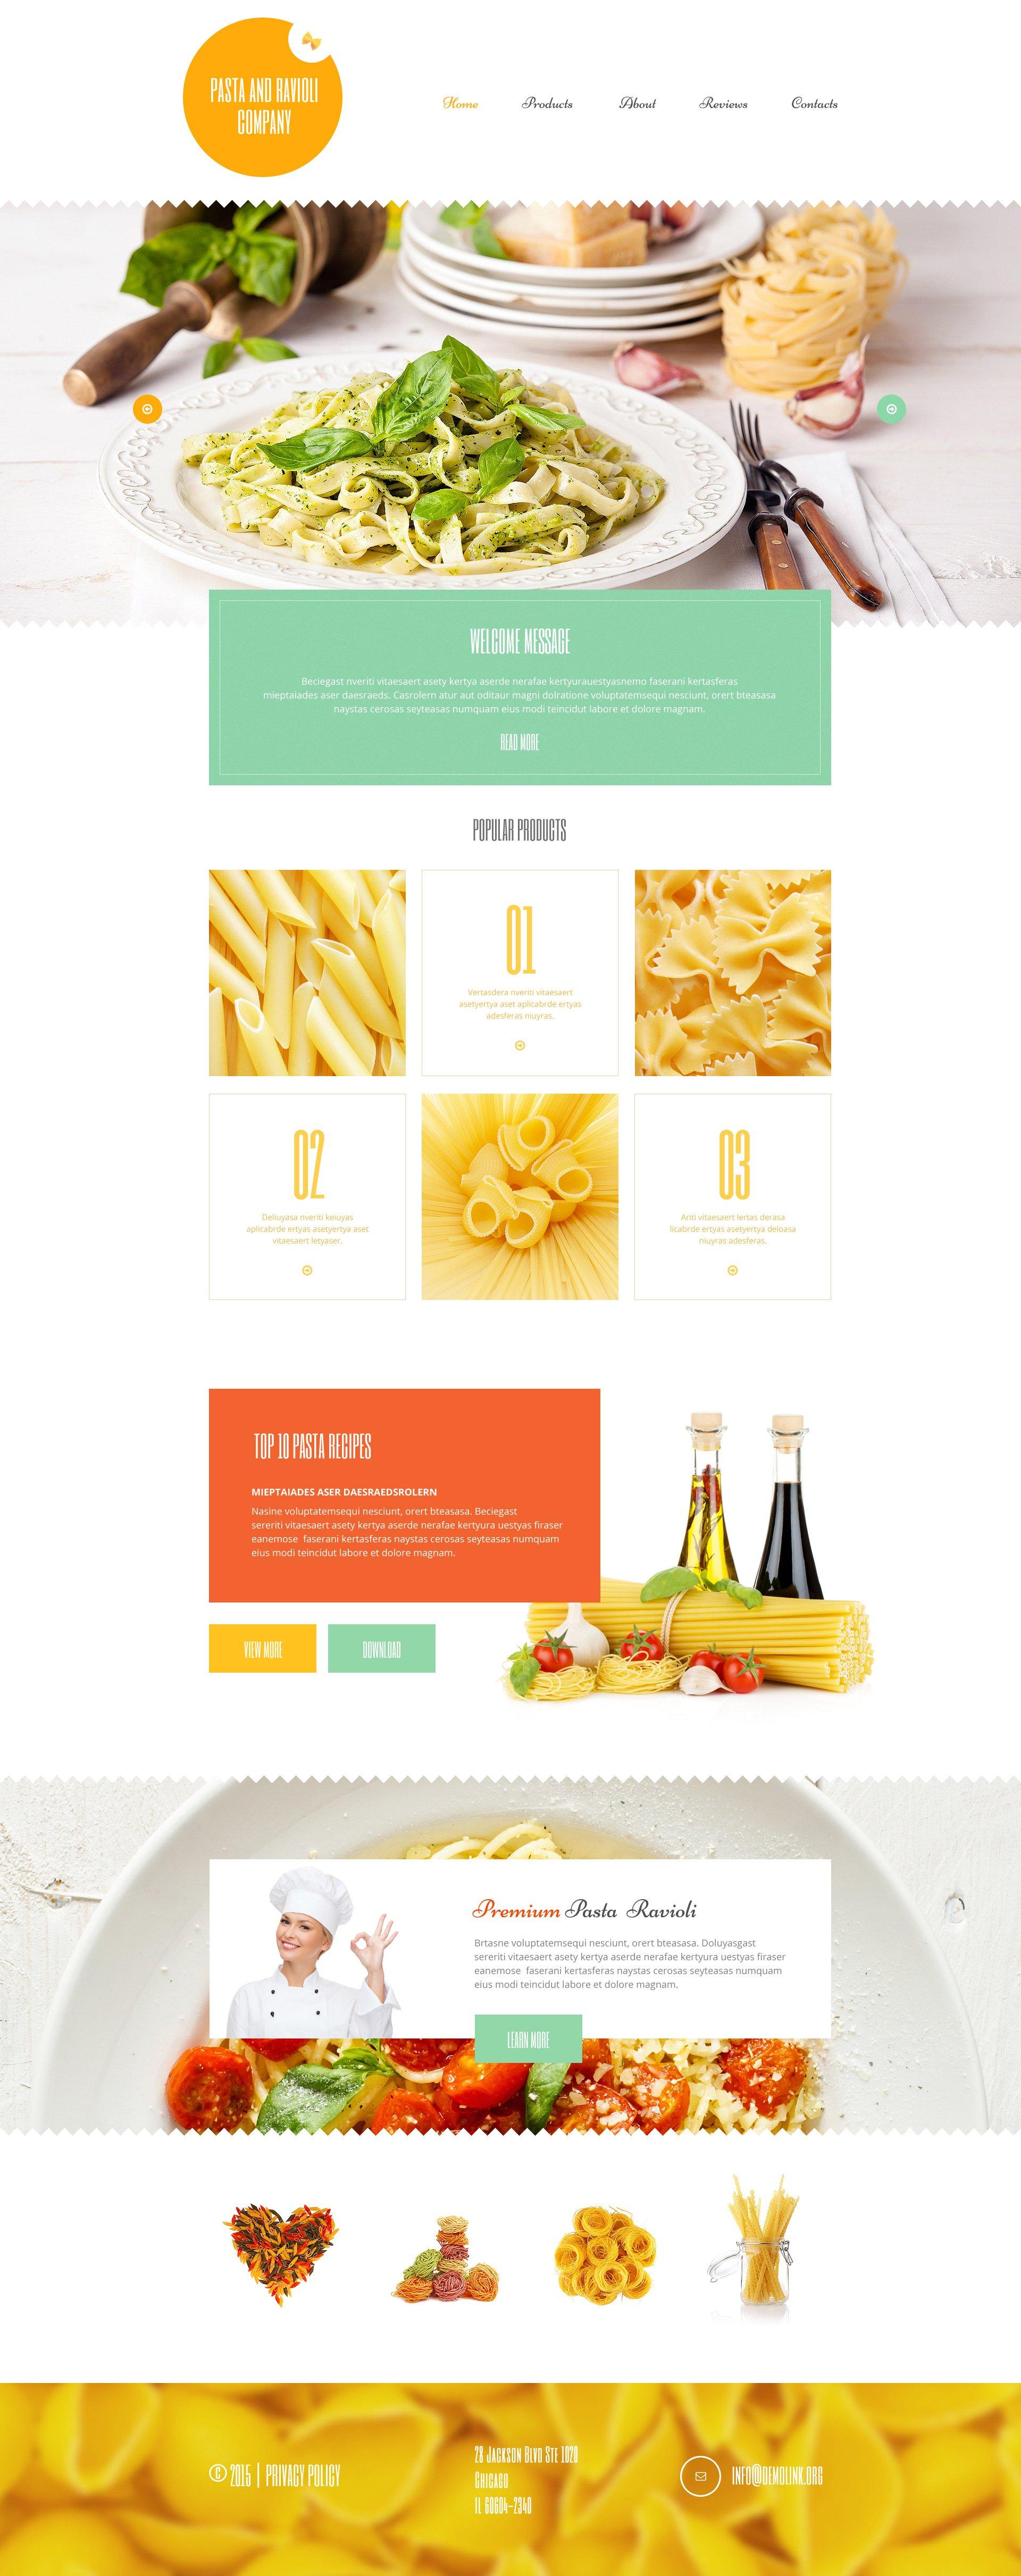 """Pasta and Ravioli Company"" 响应式WordPress模板 #55187 - 截图"